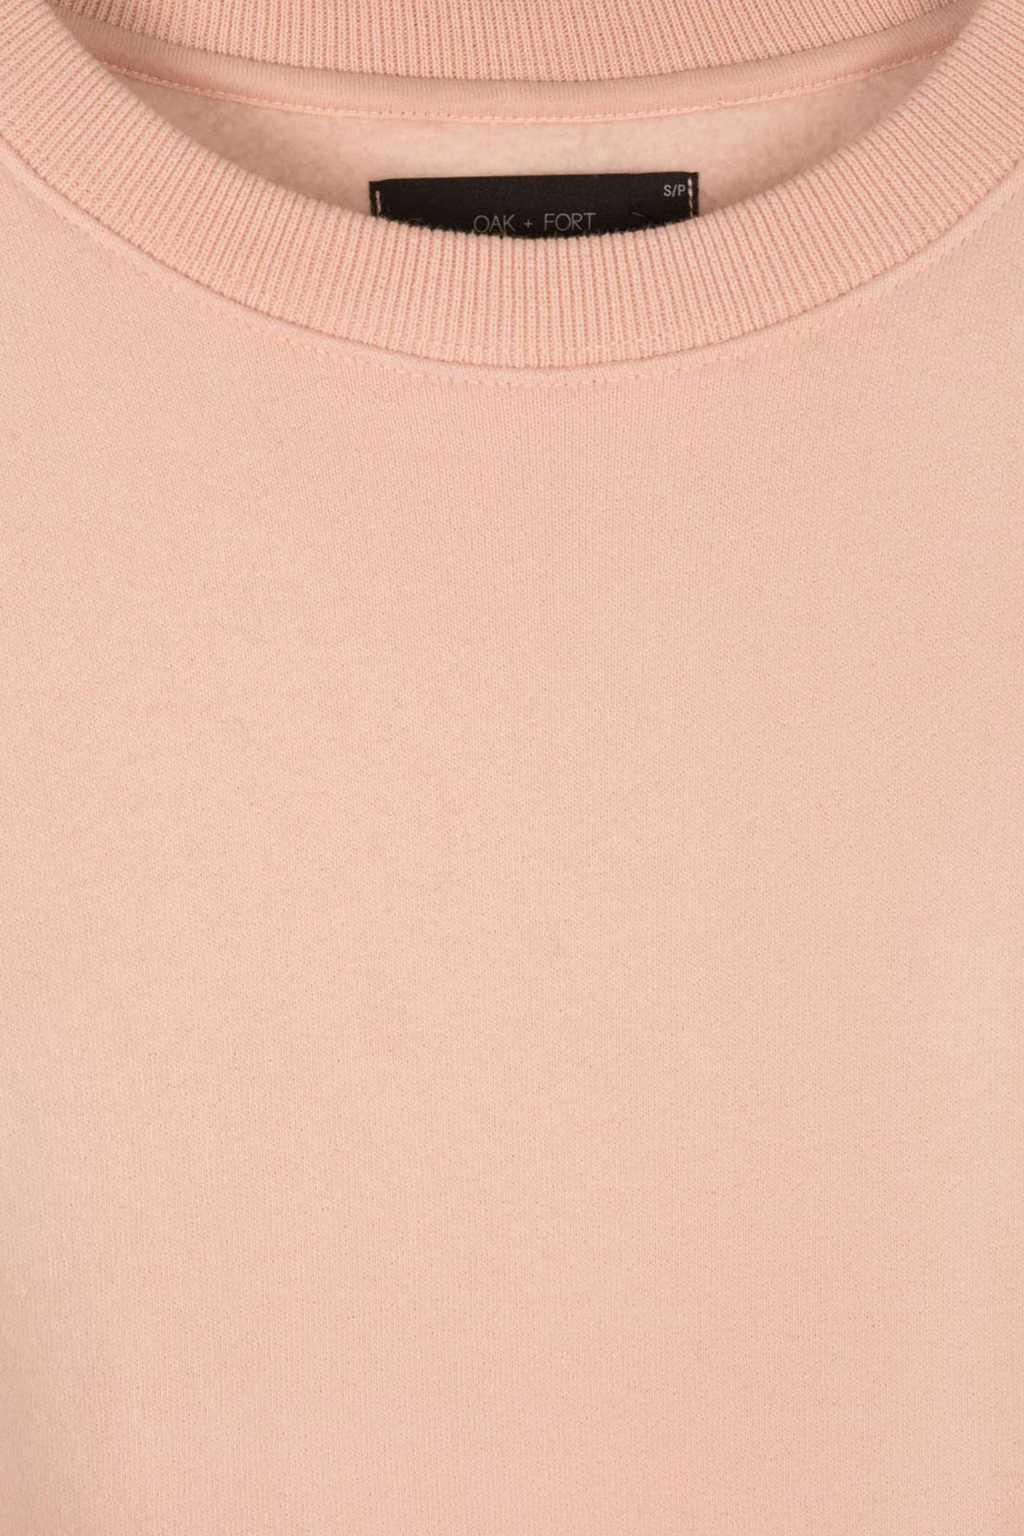 Sweatshirt 1762 Pink 8